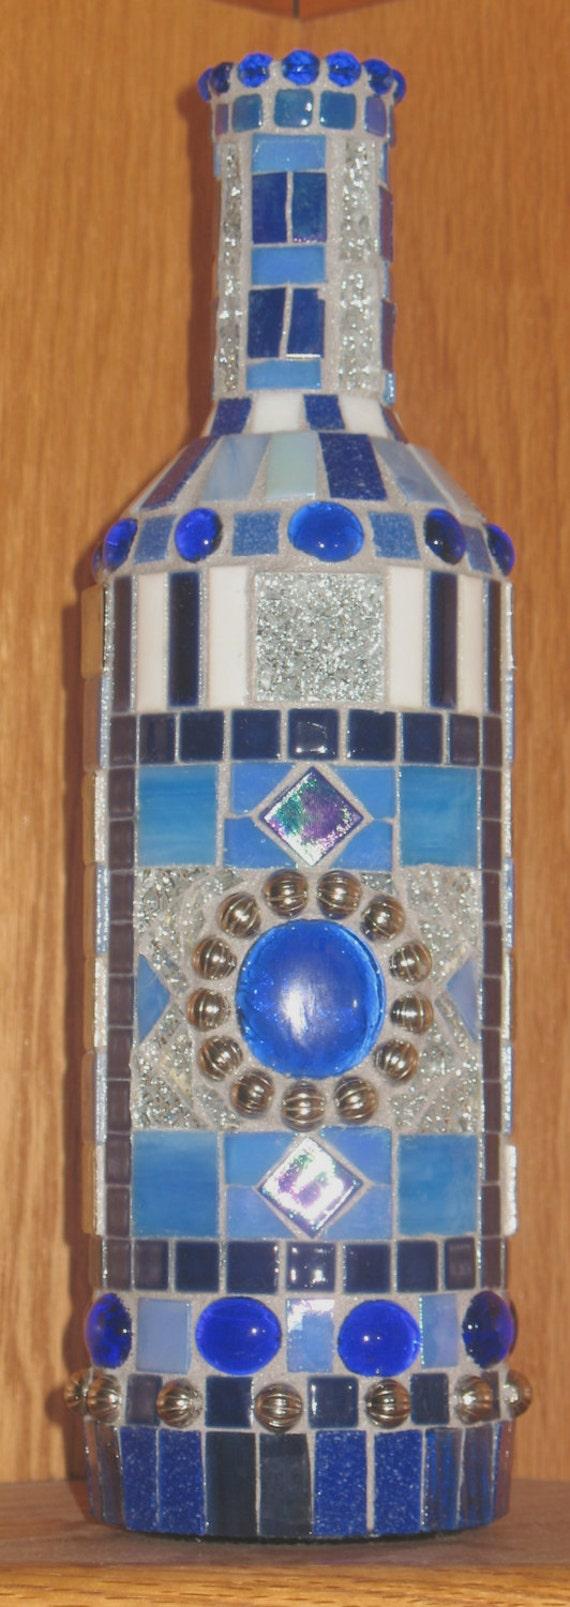 Decorative Bottle Art Mosaic Wine Bottle Glass Tiles Gift